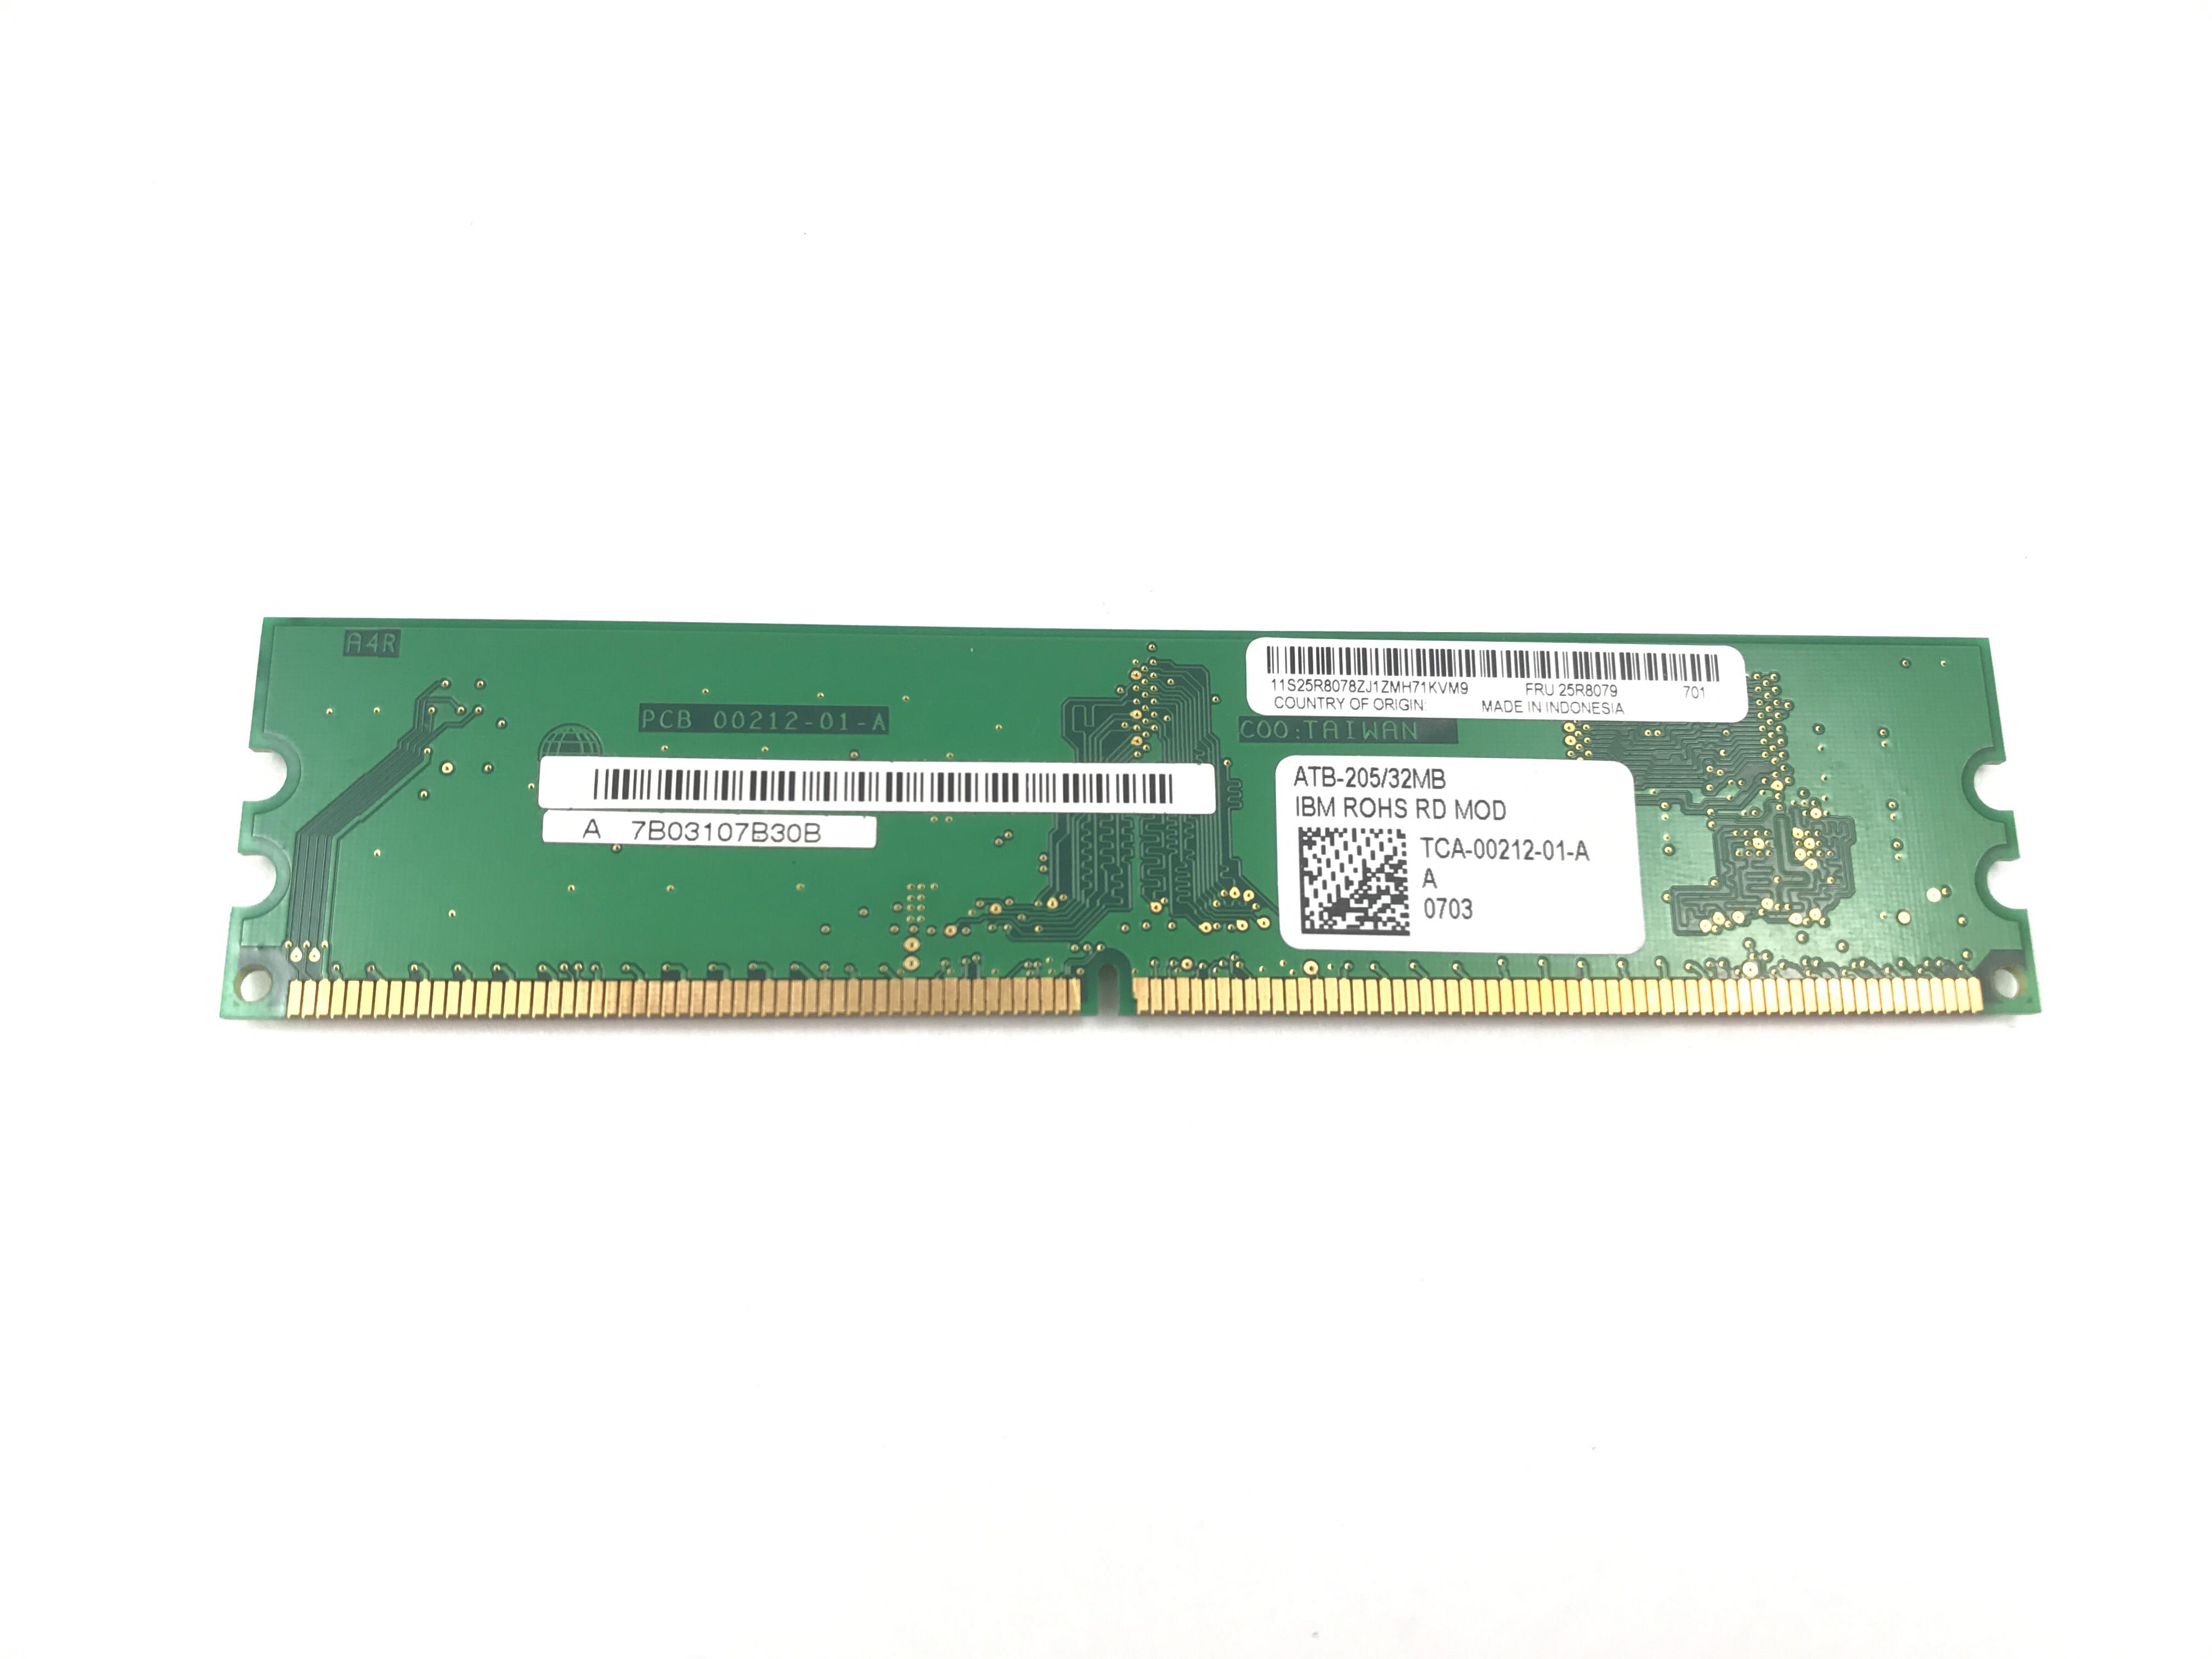 IBM Serveraid 8K-L Atb-205 / 32MB SAS Controller Tca-00212-01-A (25R8079)